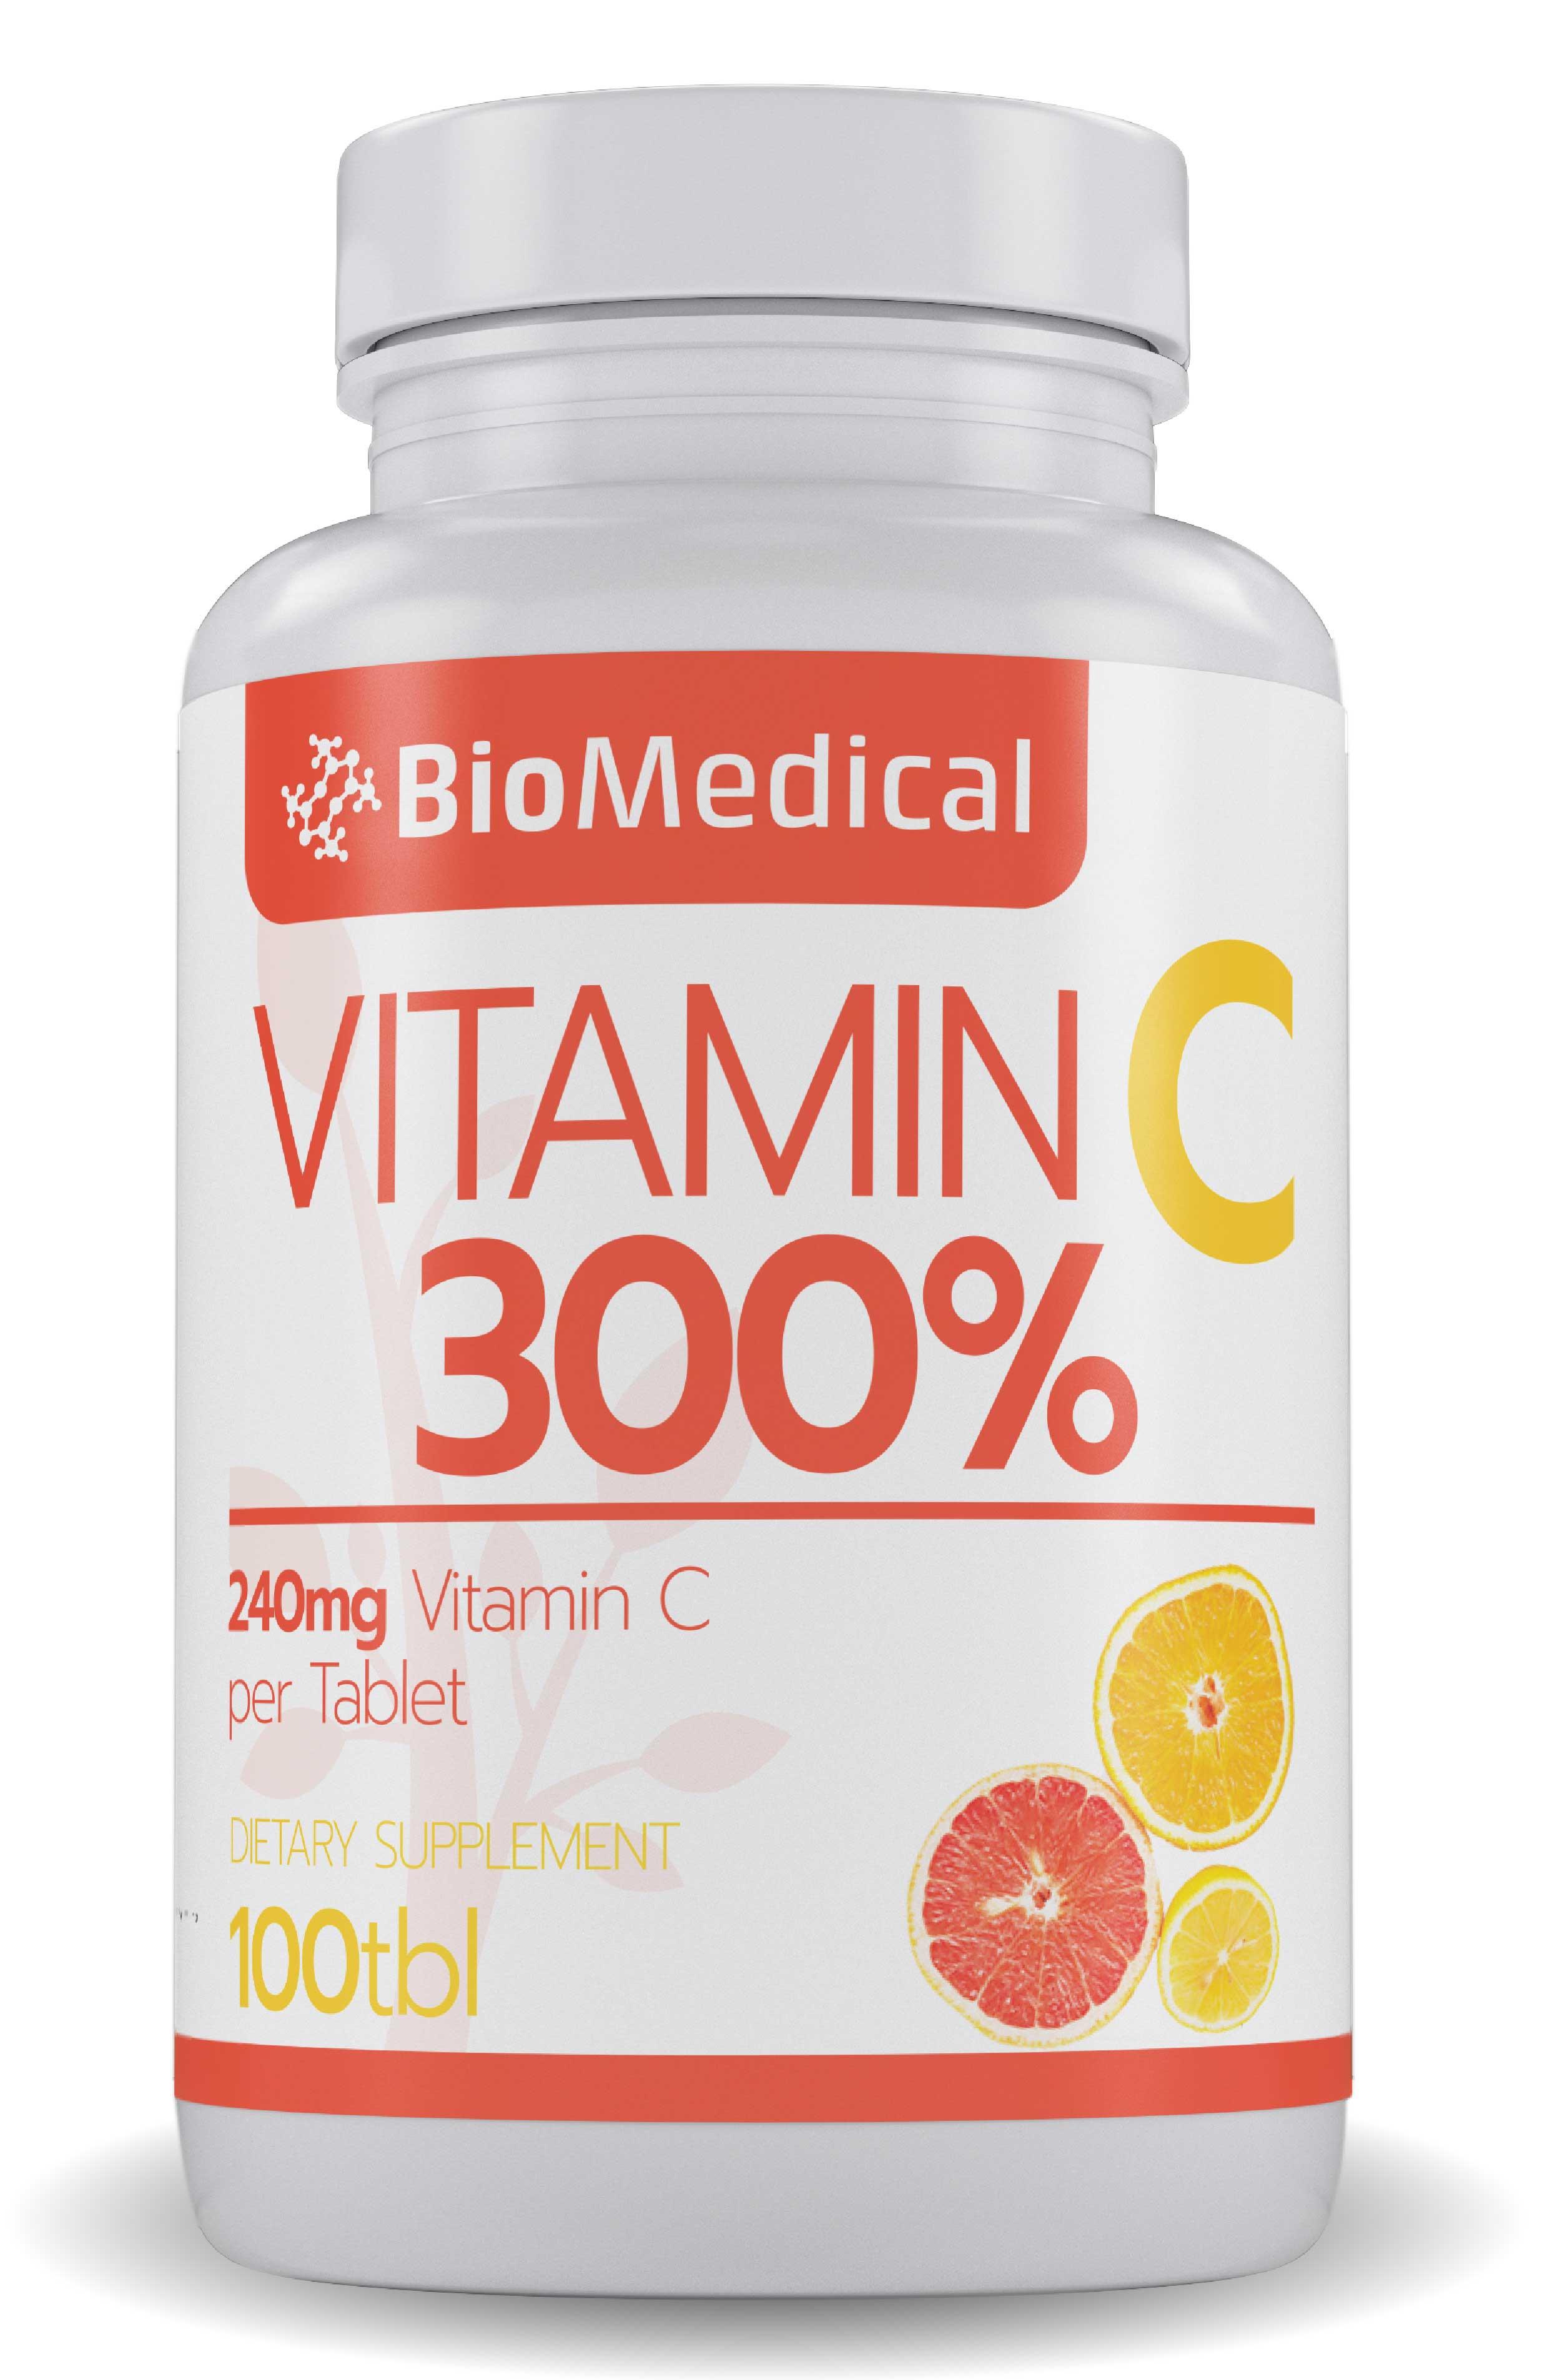 Vitamin C 300% 100 tab